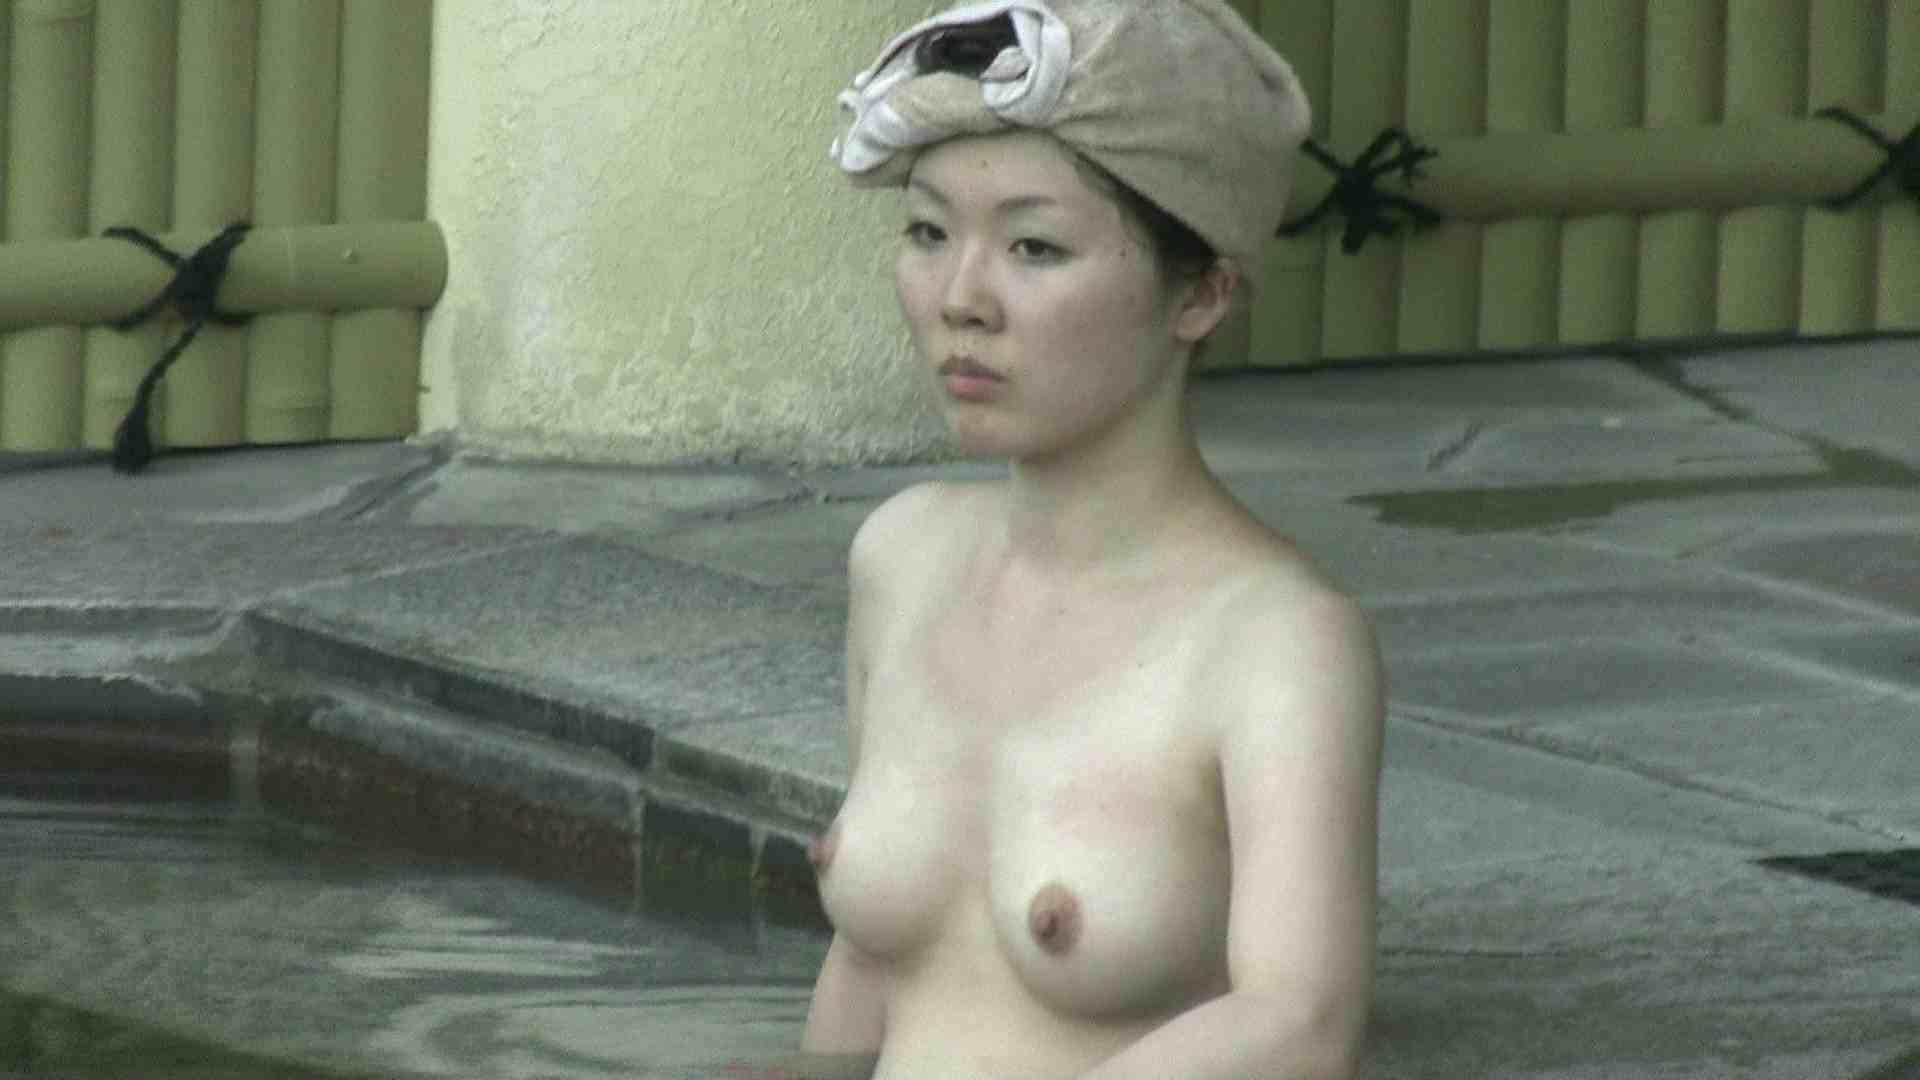 Aquaな露天風呂Vol.191 HなOL | 露天  65pic 44